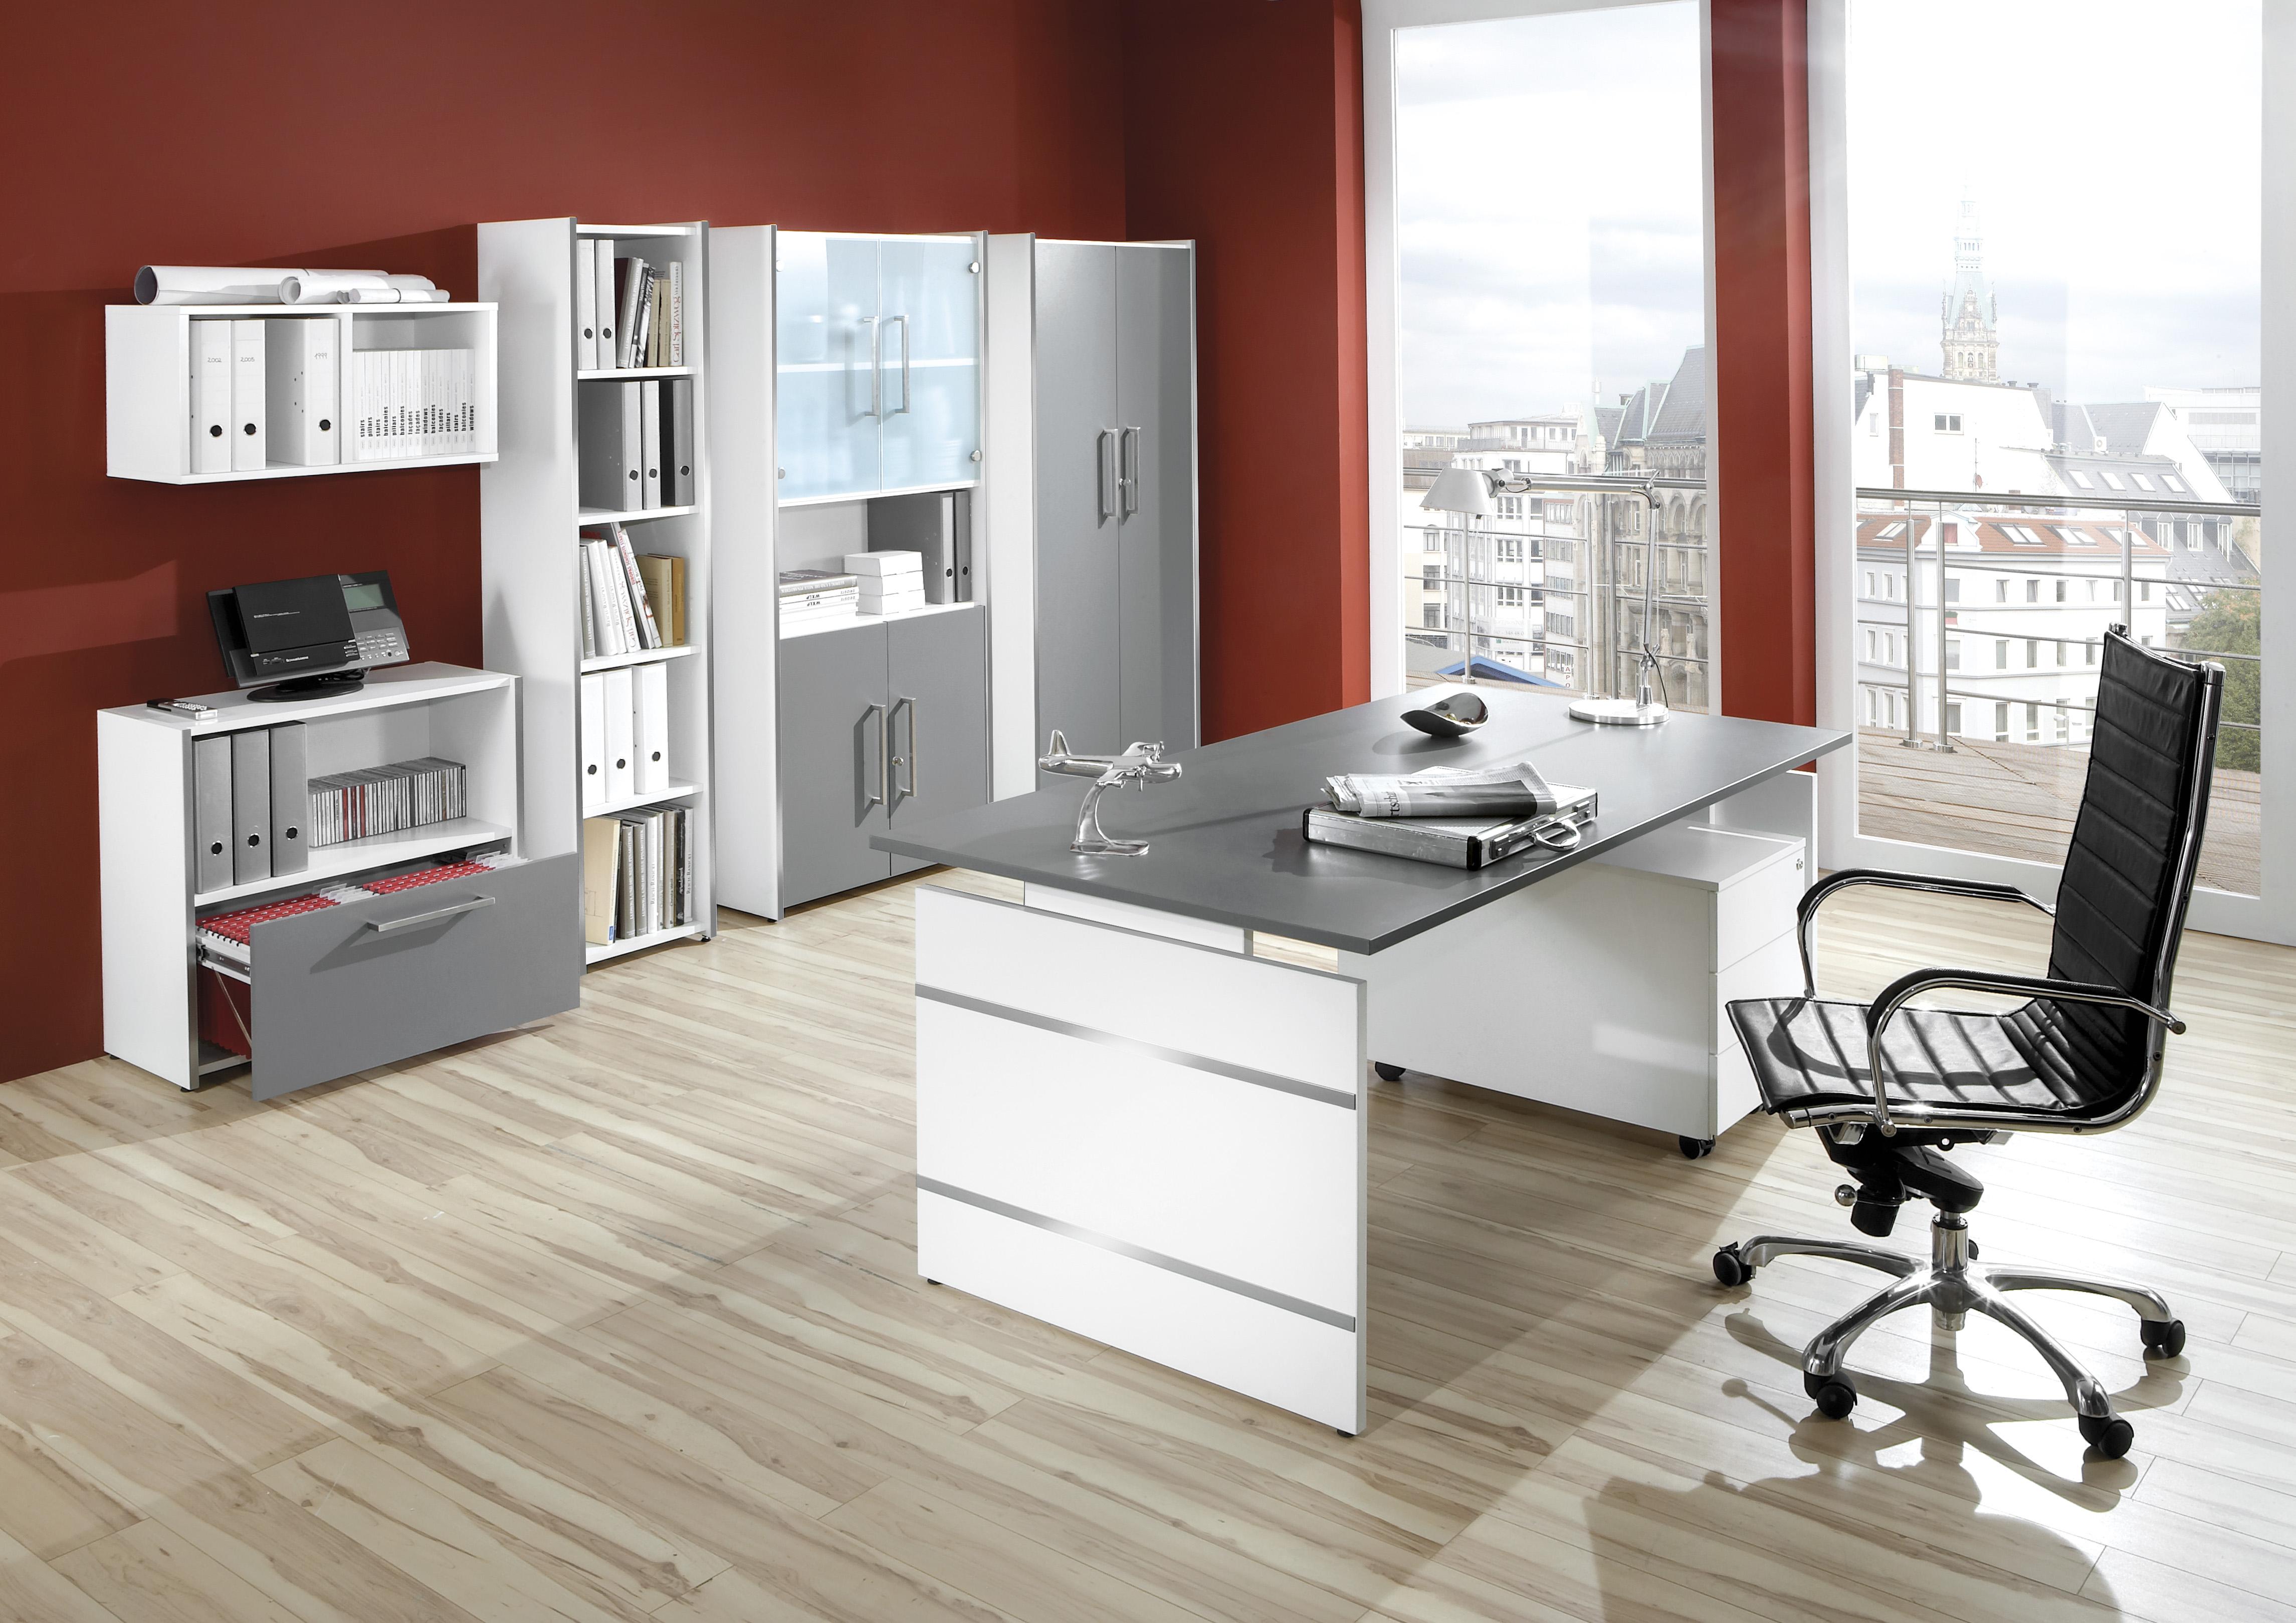 Moderne büromöbel weiss  Büromöbelprogramm Form 4 - modern & vielfältig | 123bueromoebel.de ...